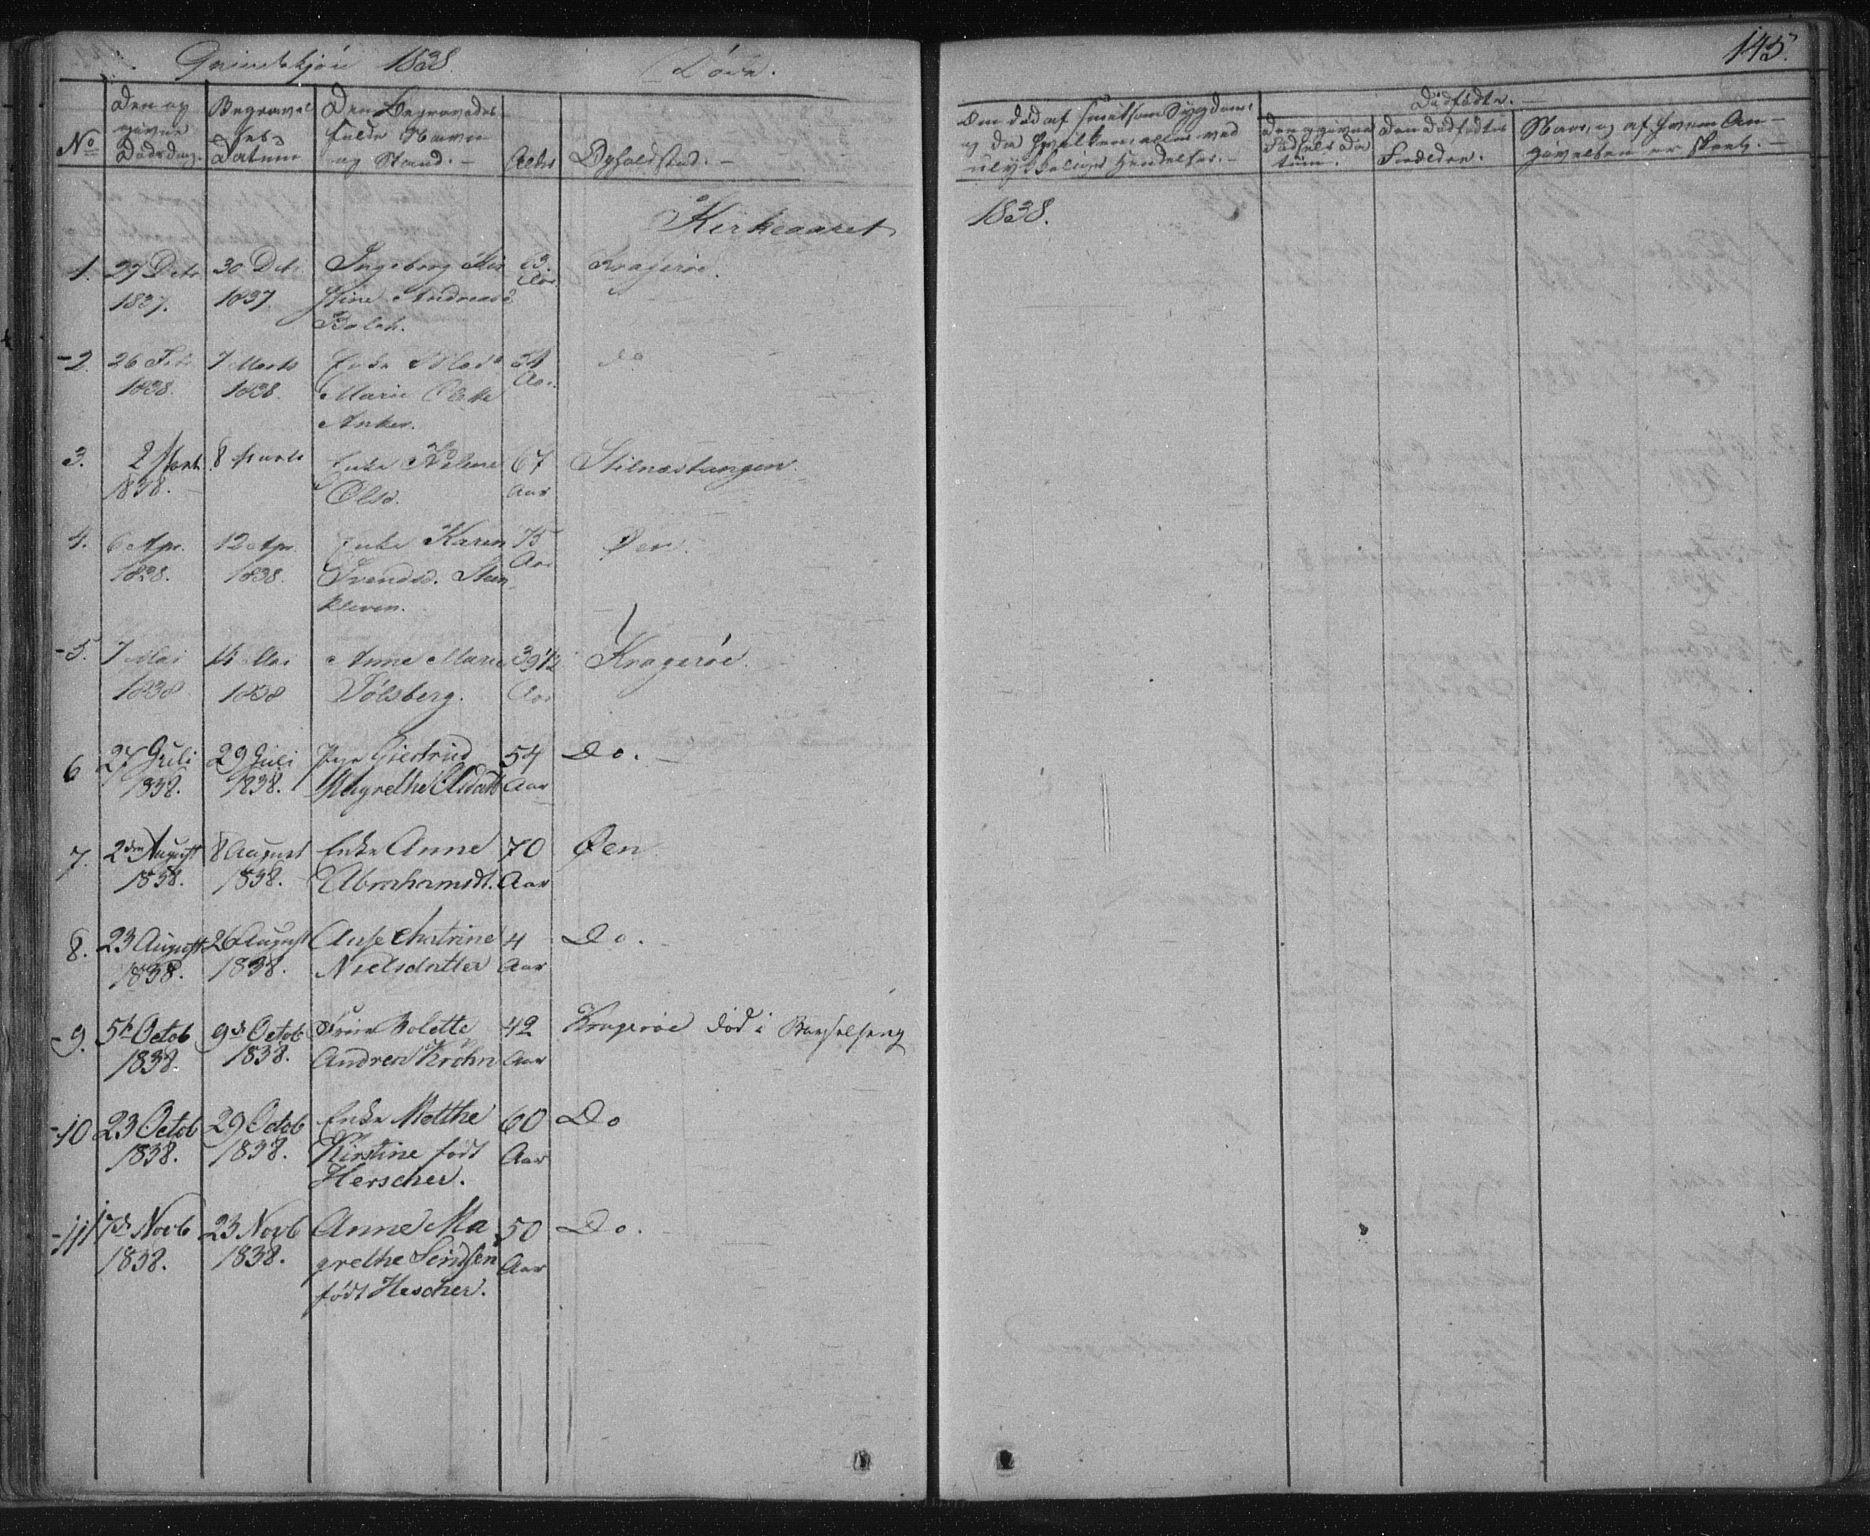 SAKO, Kragerø kirkebøker, F/Fa/L0005: Ministerialbok nr. 5, 1832-1847, s. 145